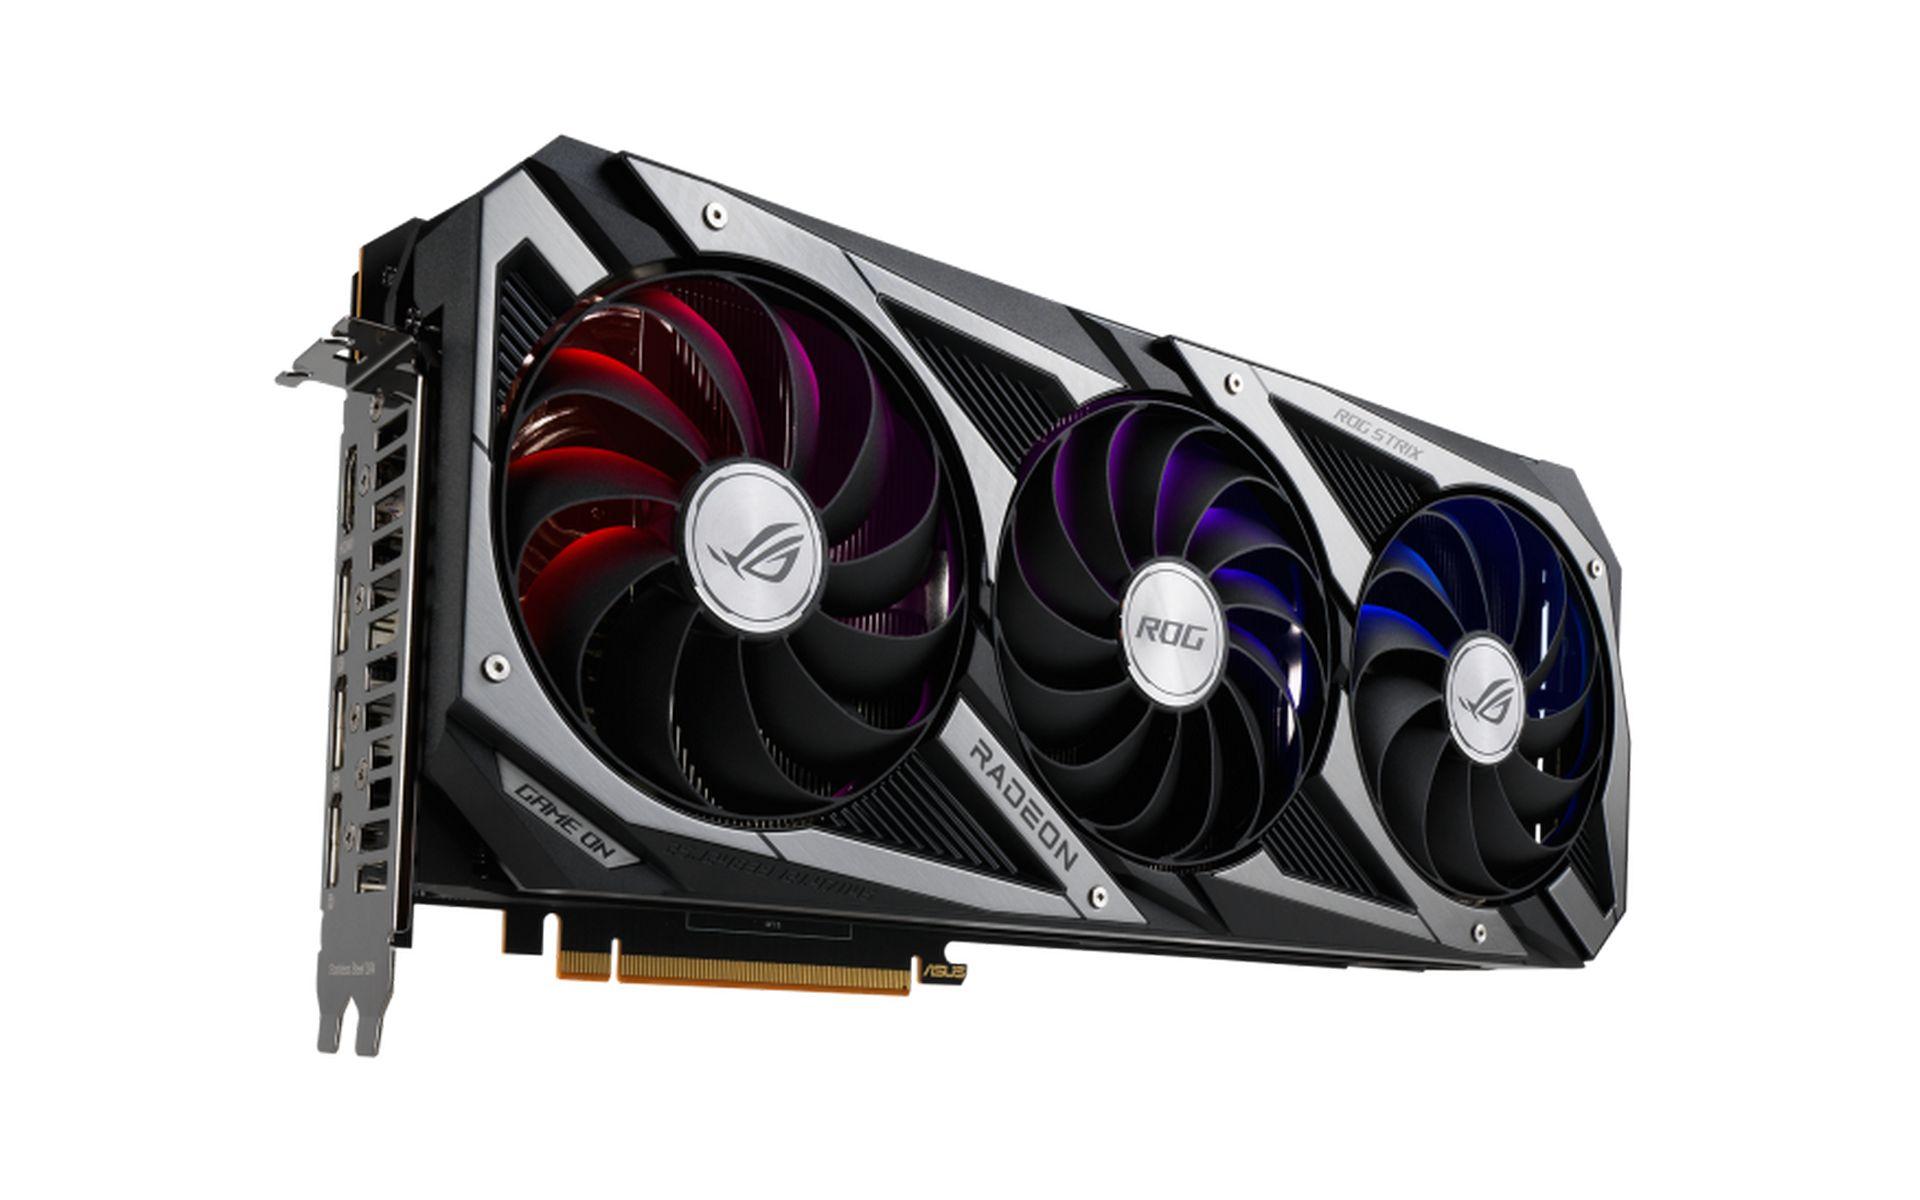 Card đồ họa ASUS ROG Strix Radeon RX 6800 OC 16GB GAMING